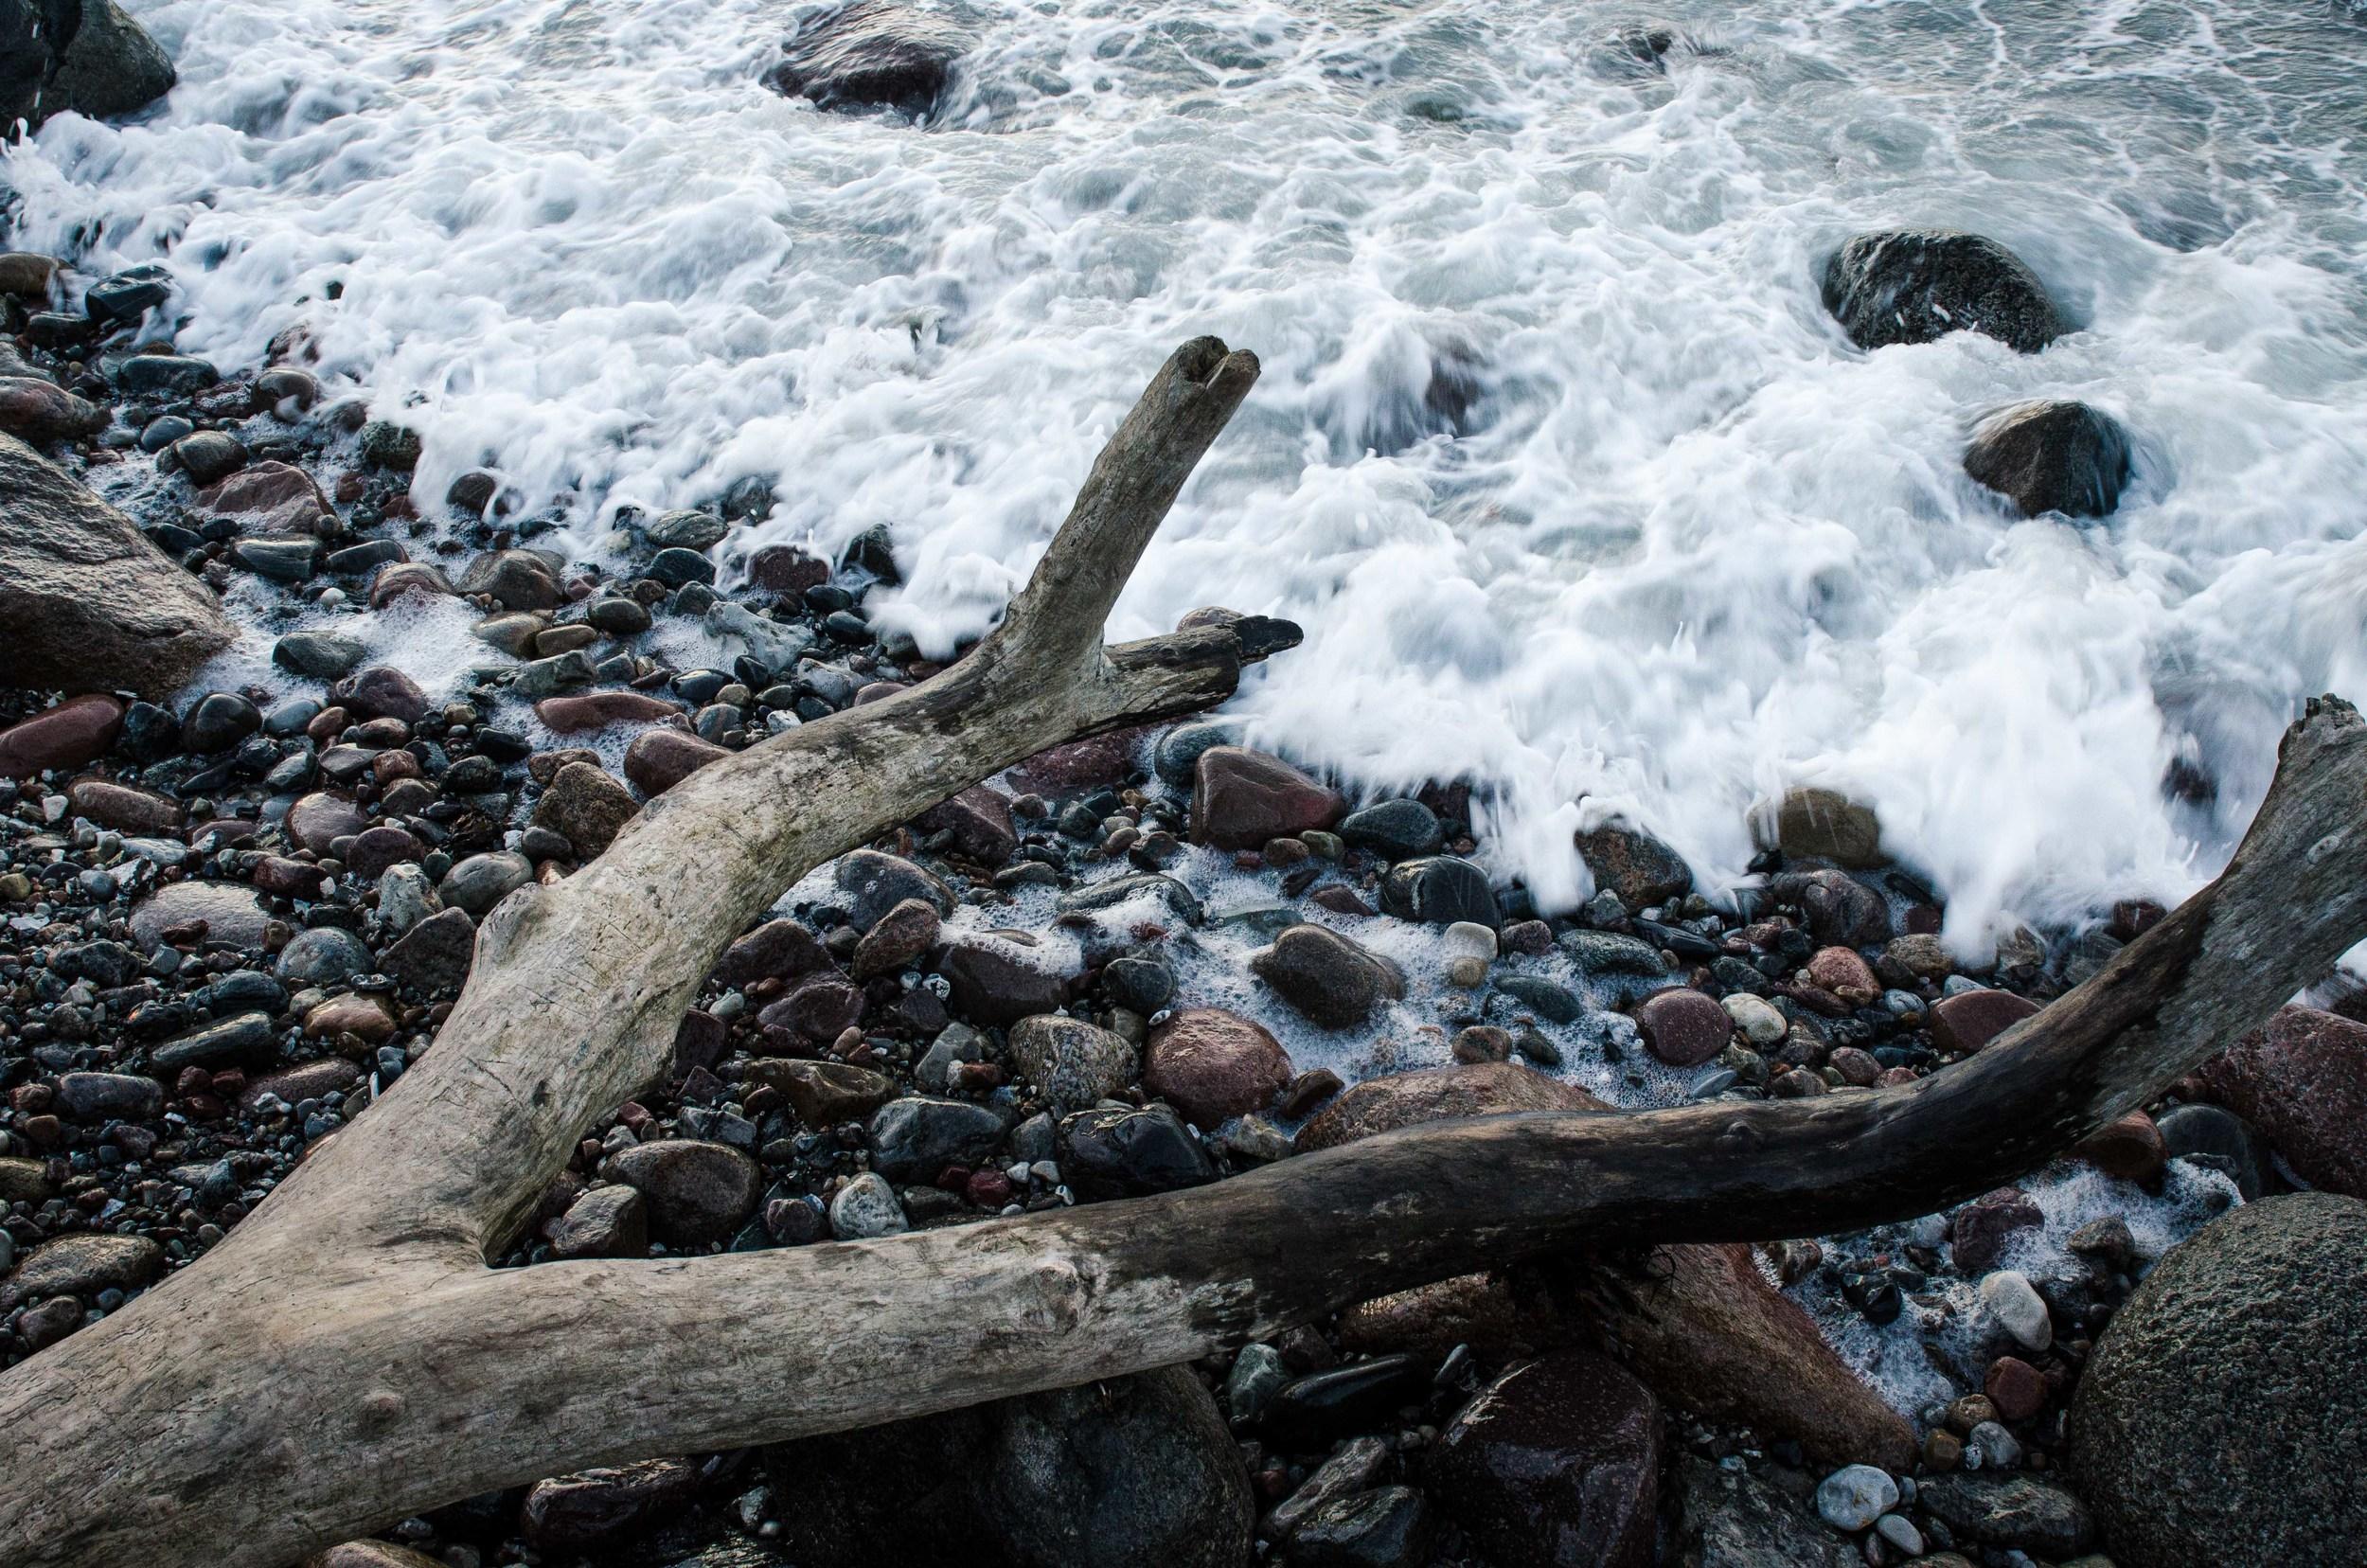 Adventure_photographer_ocean_sea_walk_sunset-3.jpg